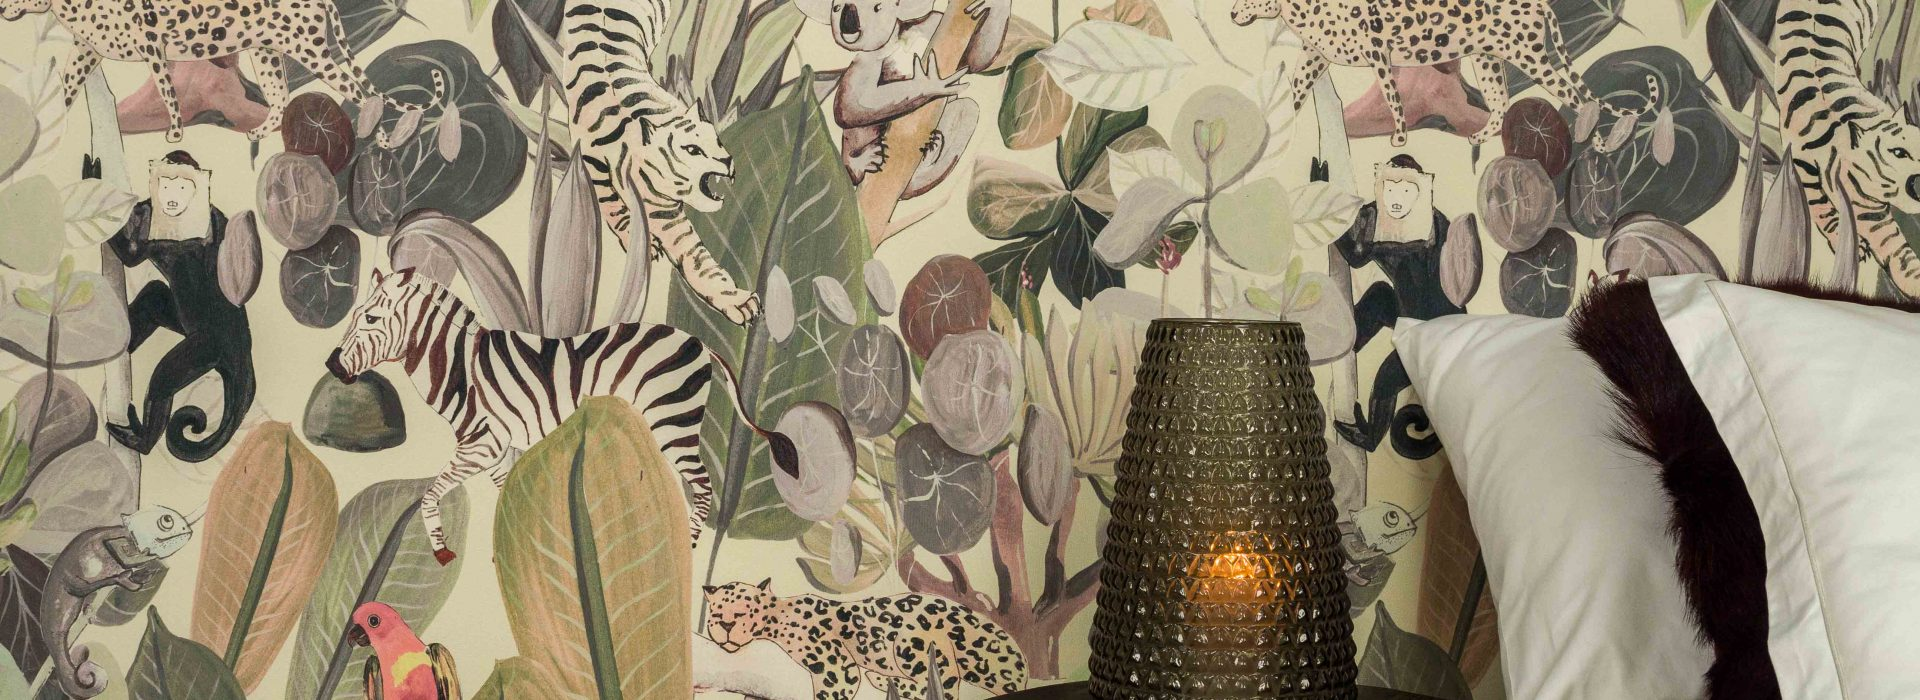 Wandverkleidungen aus Textil Rainforest kollektion by Kanvazz